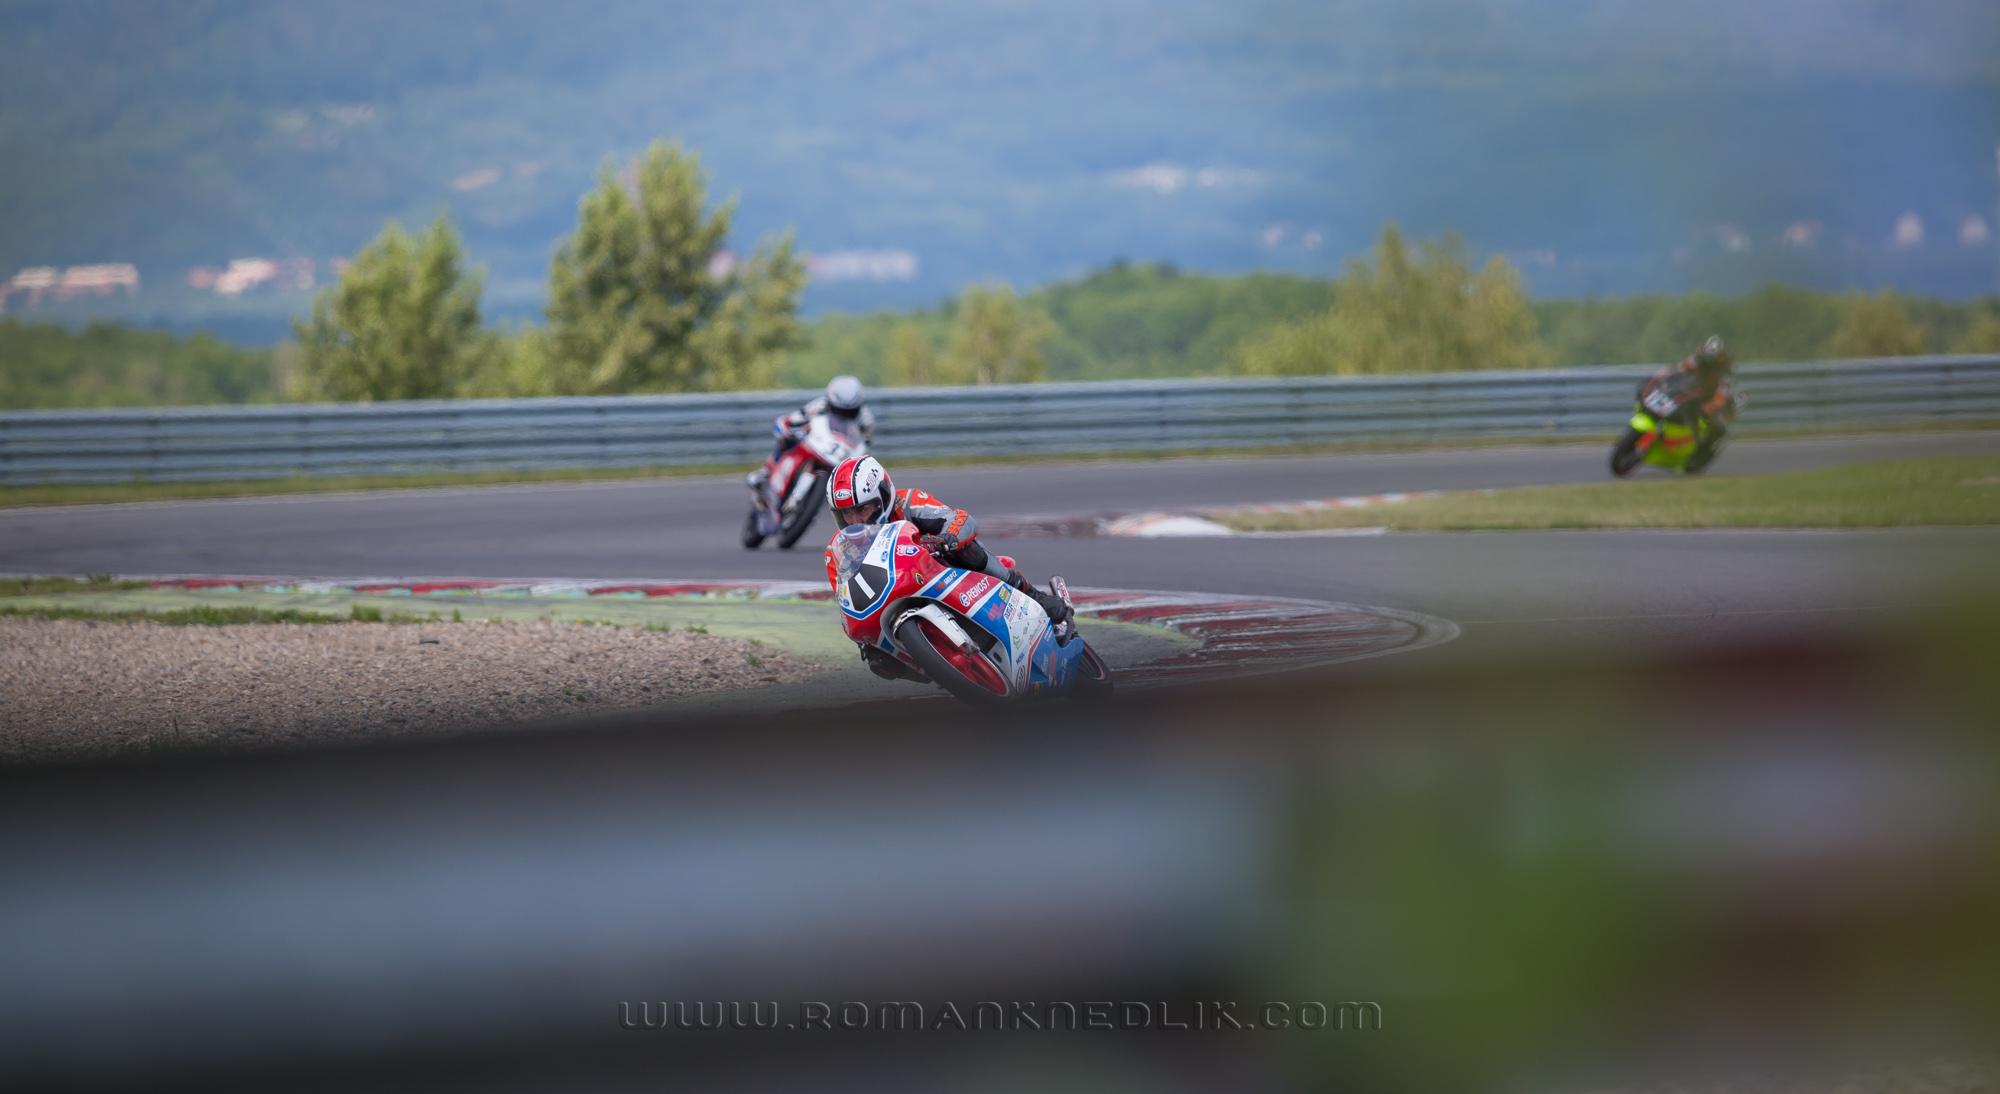 Alpe_Adria_European_Championship-22